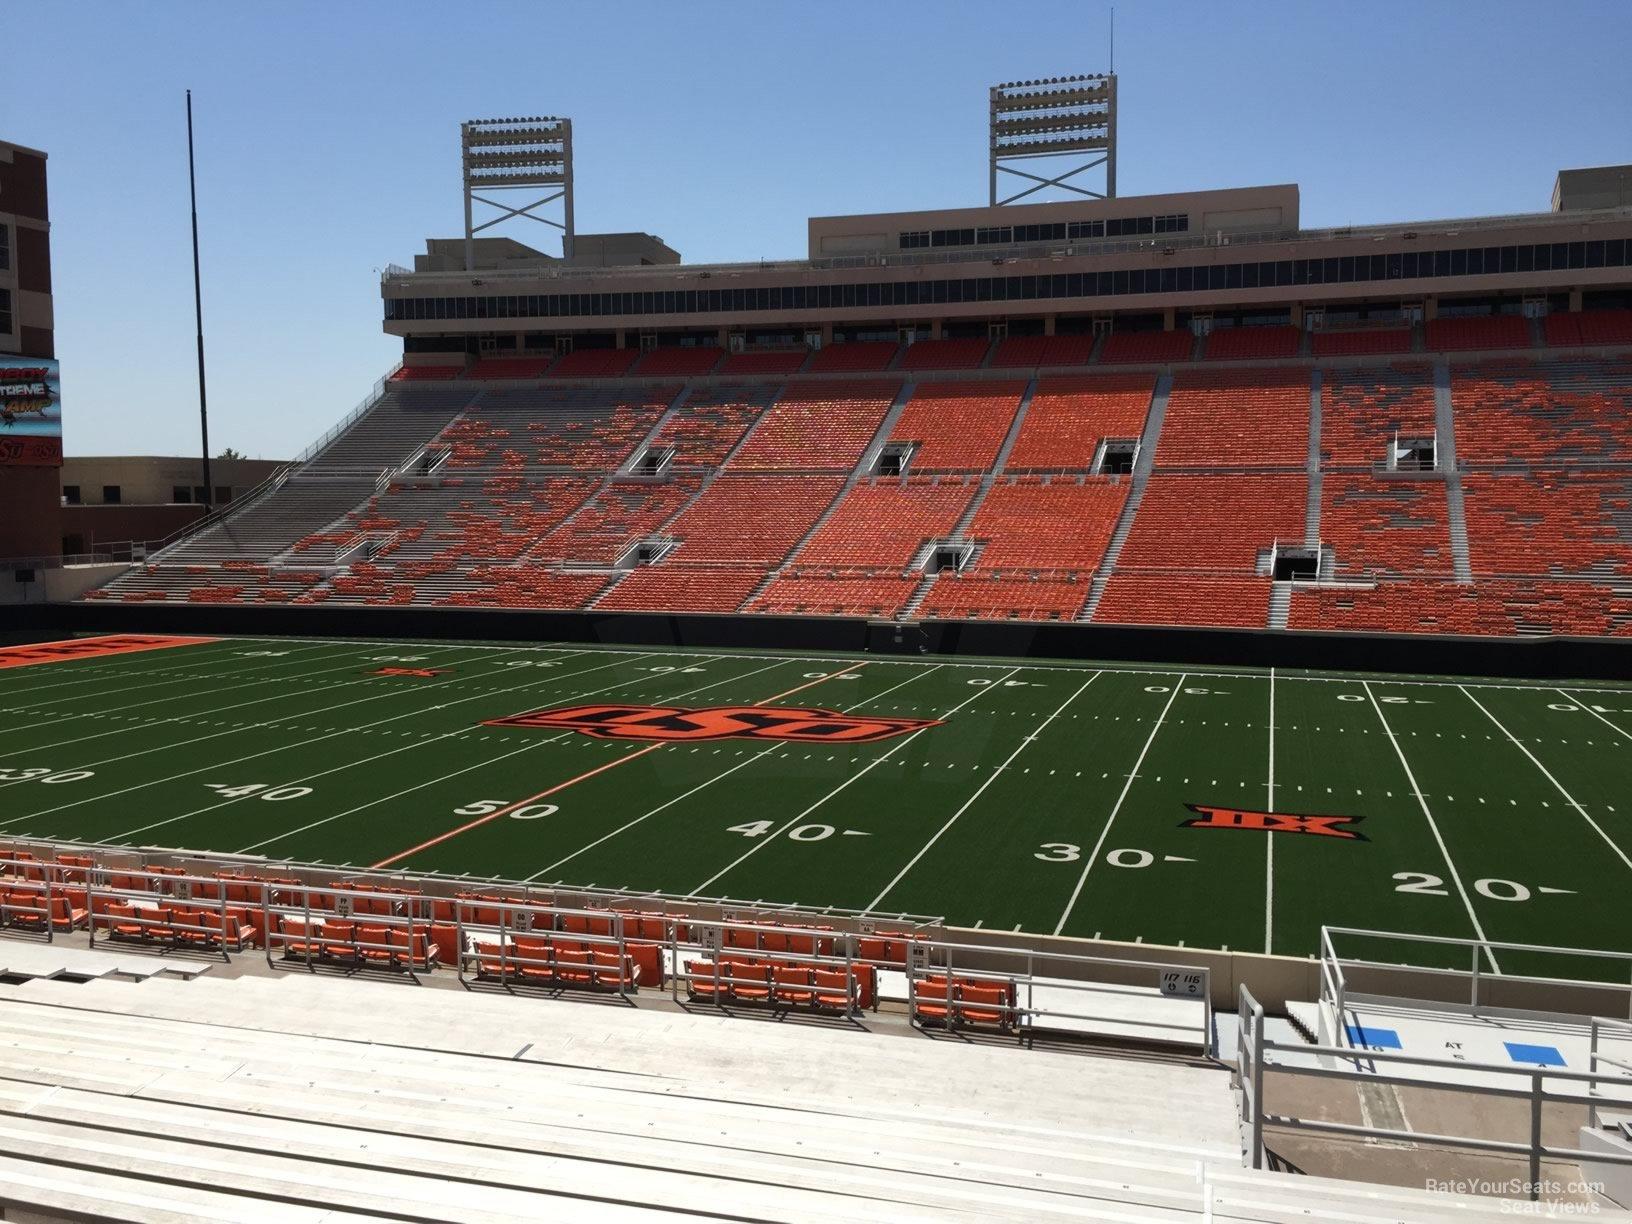 Boone Pickens Stadium Section 224 - RateYourSeats.com